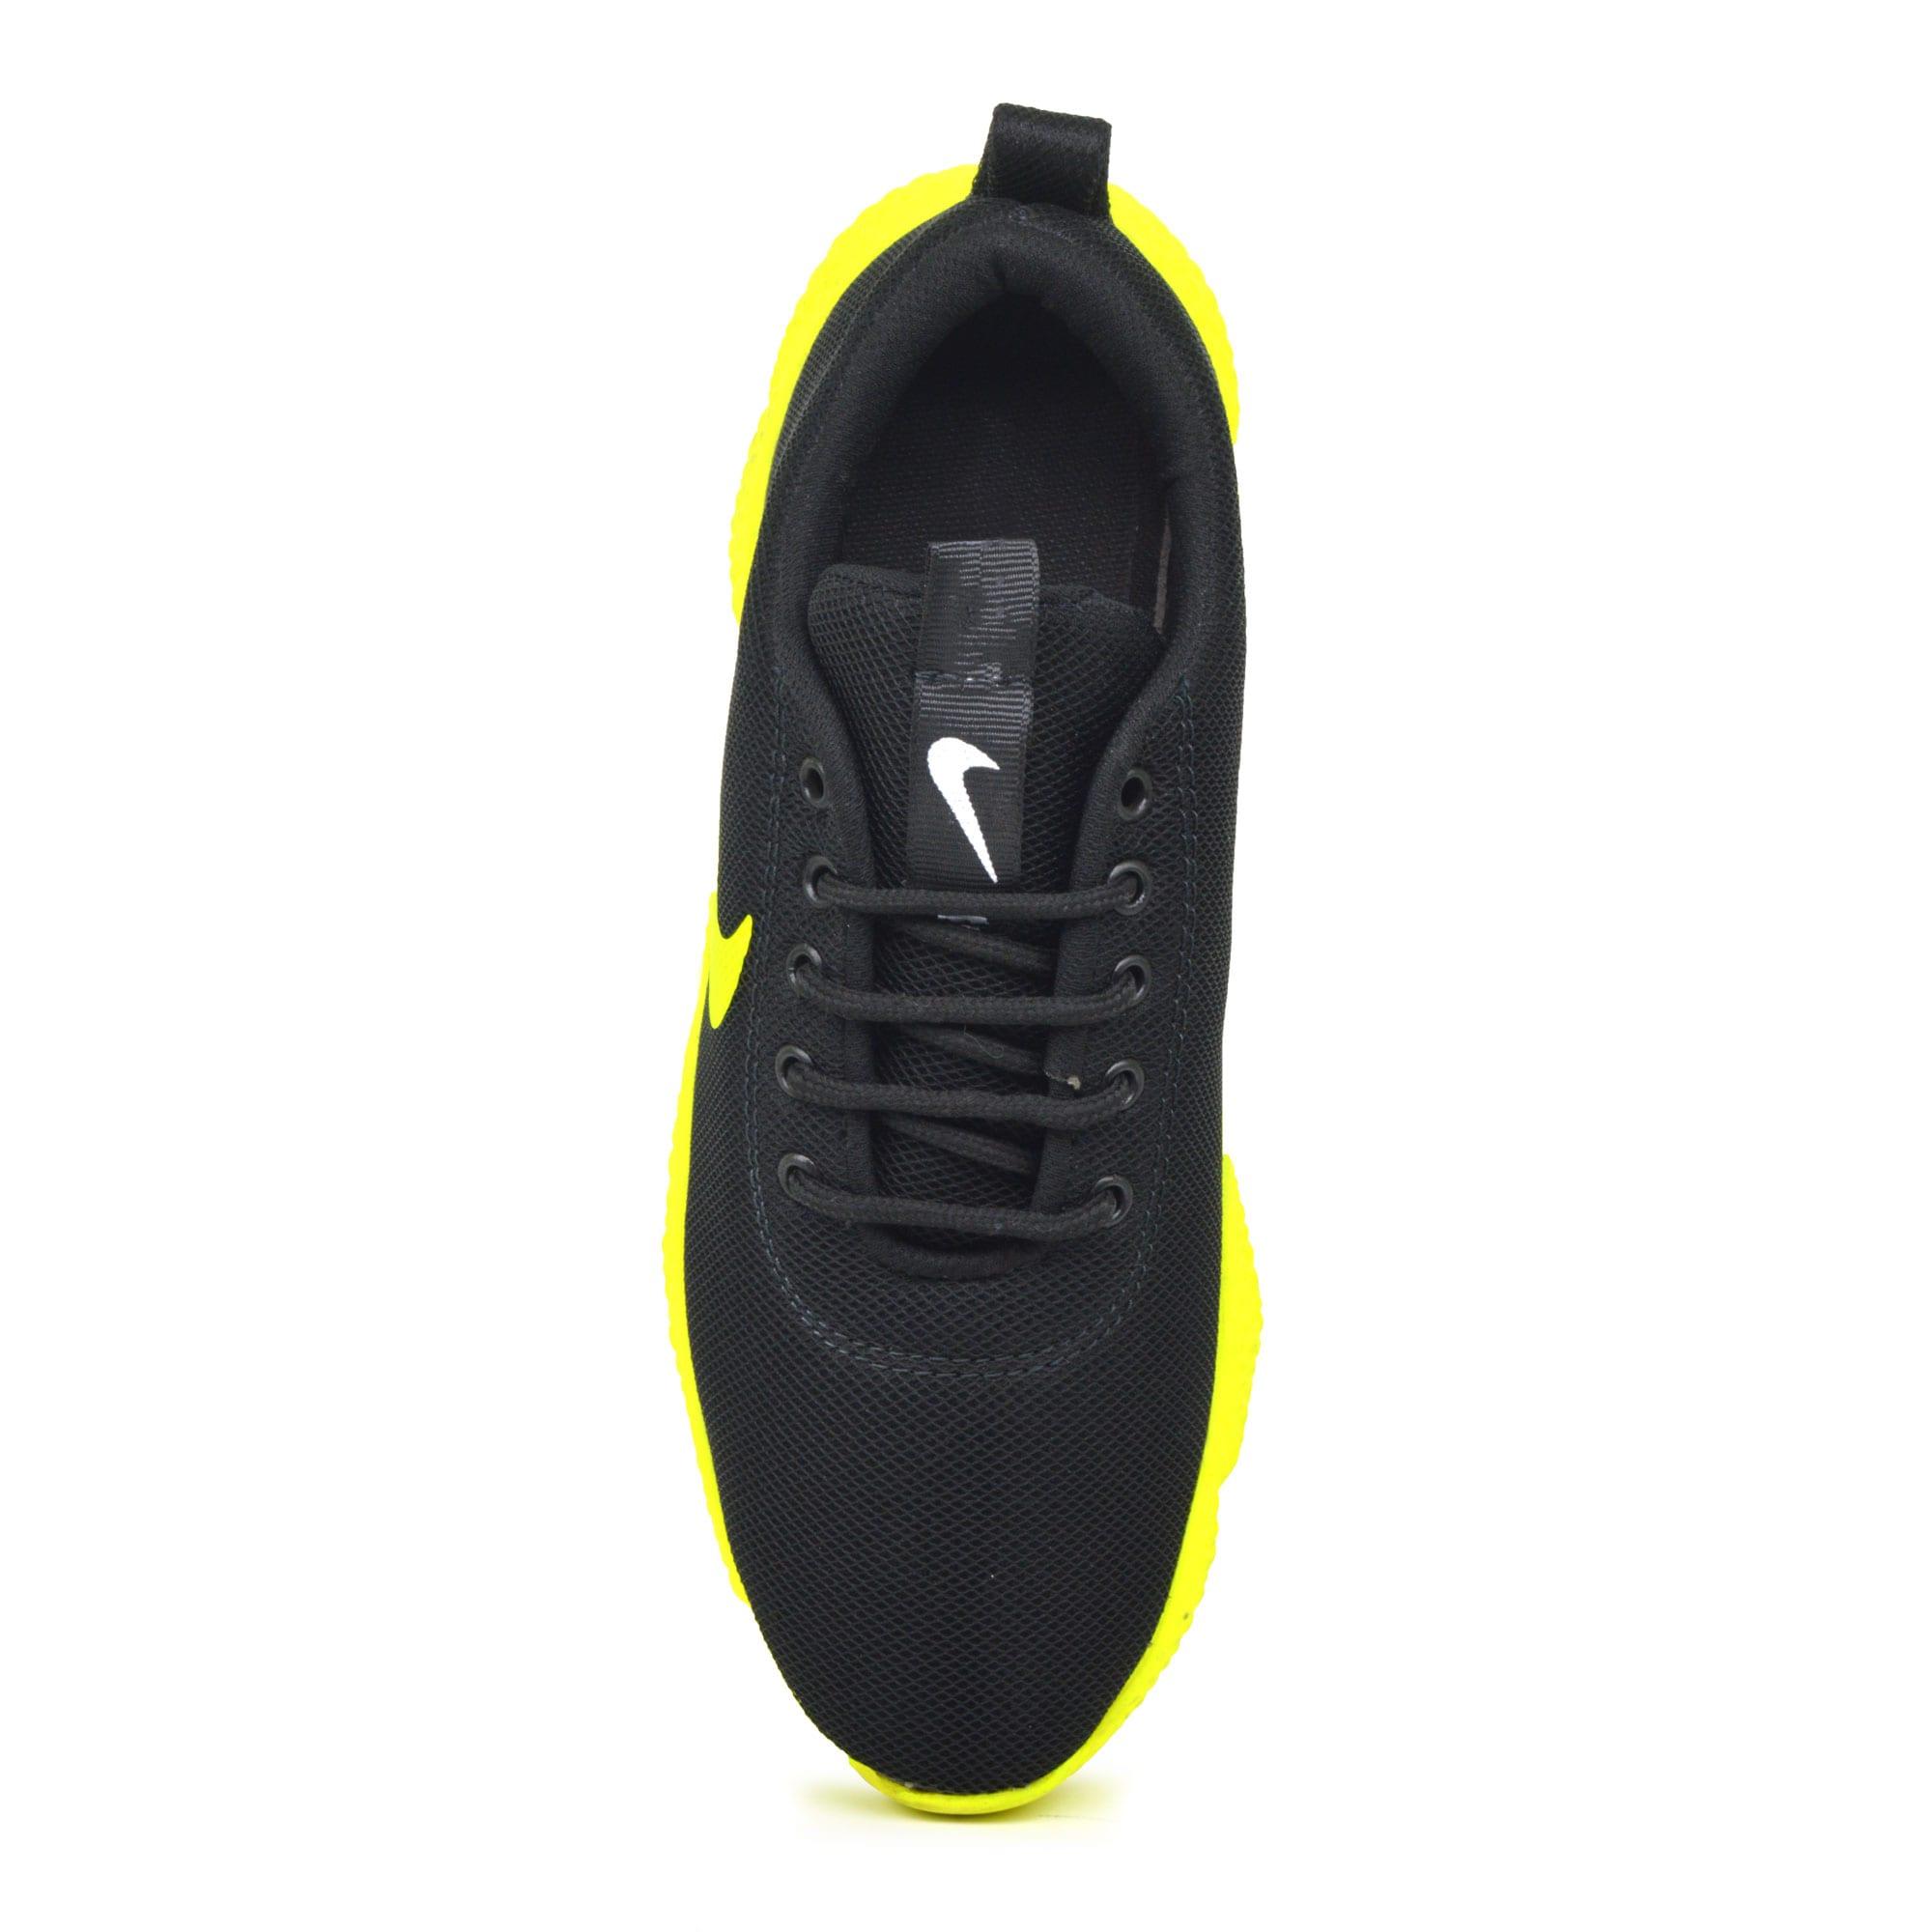 IMCOLUS25.171_BLACK  OUTDOOR WEAR & FLEXIBLE MENS Sports Shoes SHOES  IMCOLUS25.171_BLACK (BLACK,6TO10,8 PAIR)